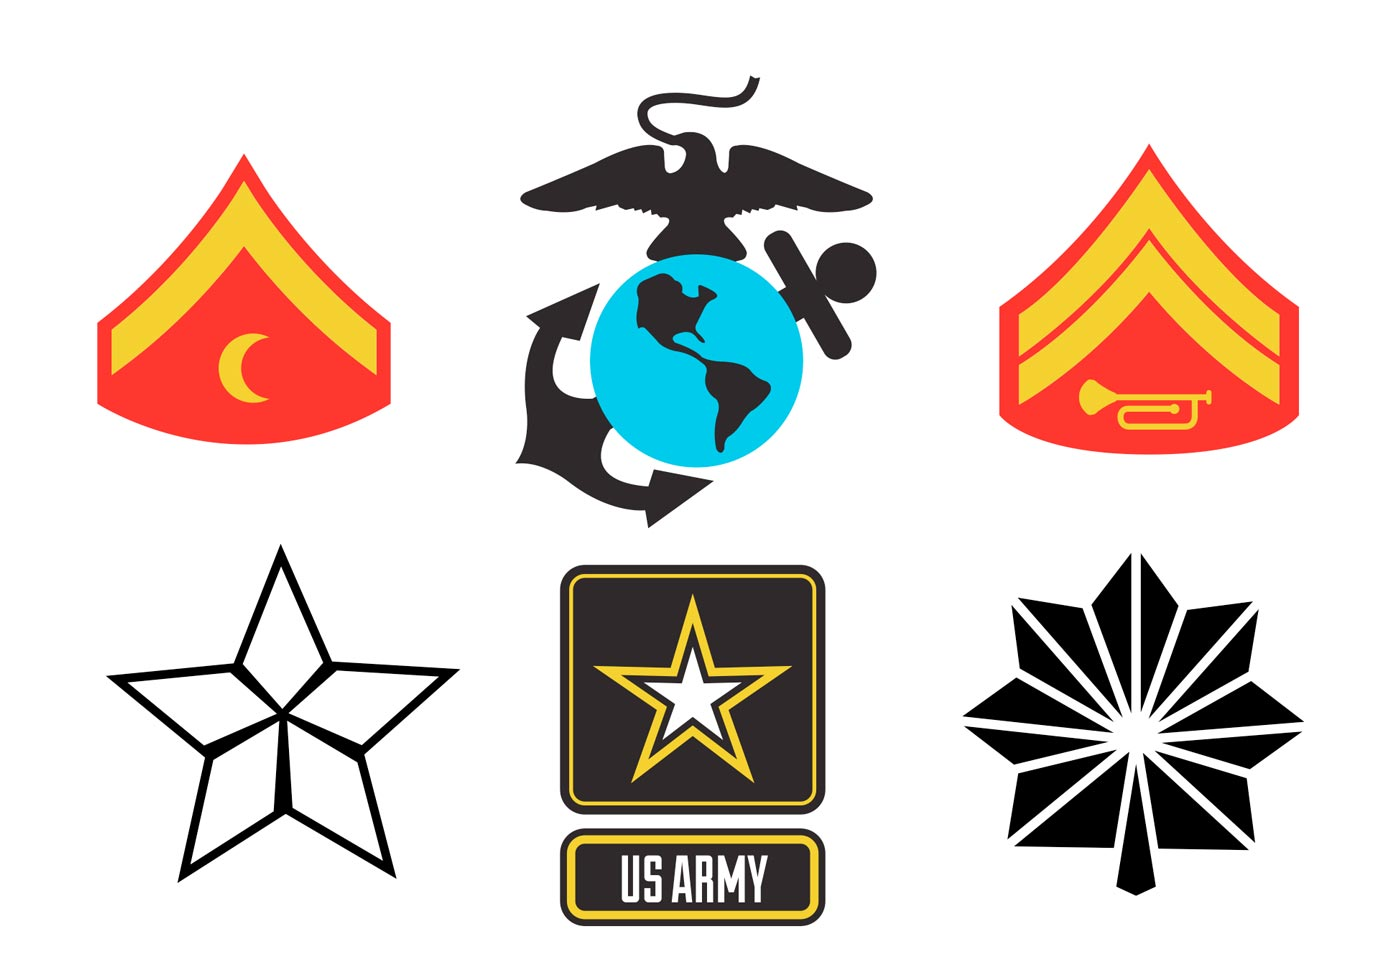 United states marine corps vectors download free vector art stock united states marine corps vectors download free vector art stock graphics images buycottarizona Image collections